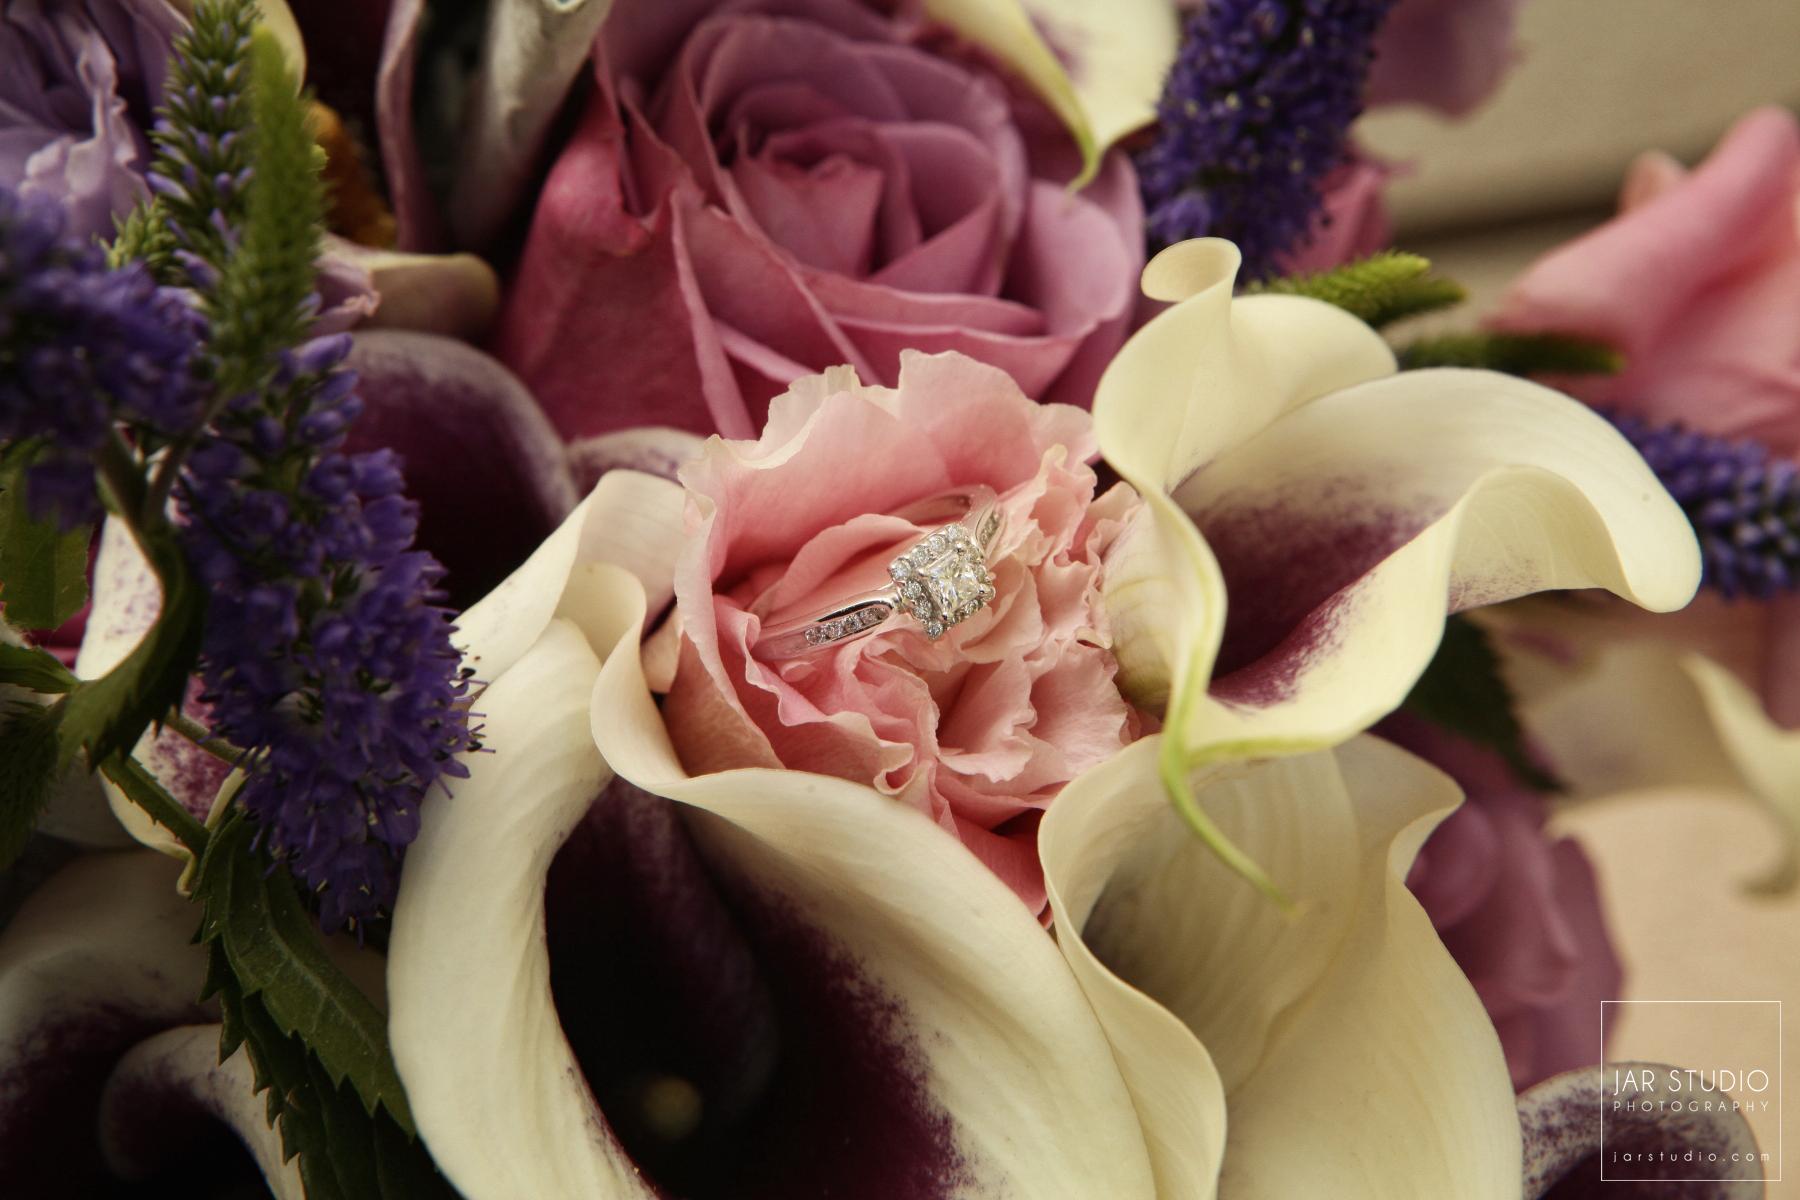 02-wedding-ring-flowers-beautiful-color-palette-jarstudio-wedding-photographer.JPG